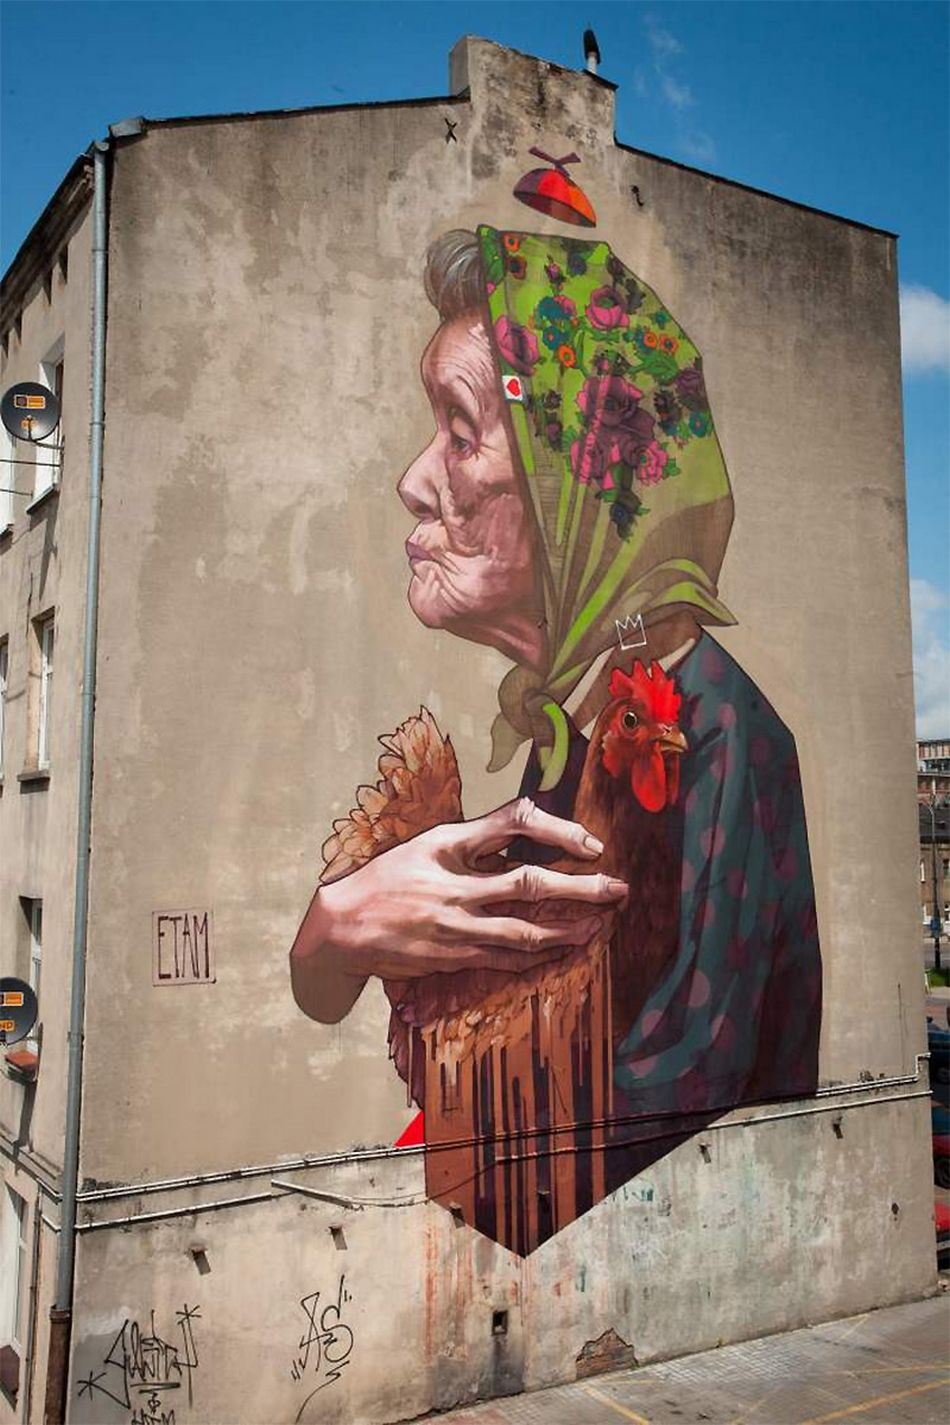 etam-cru-bezt-sainer-street-art-large-murals-13